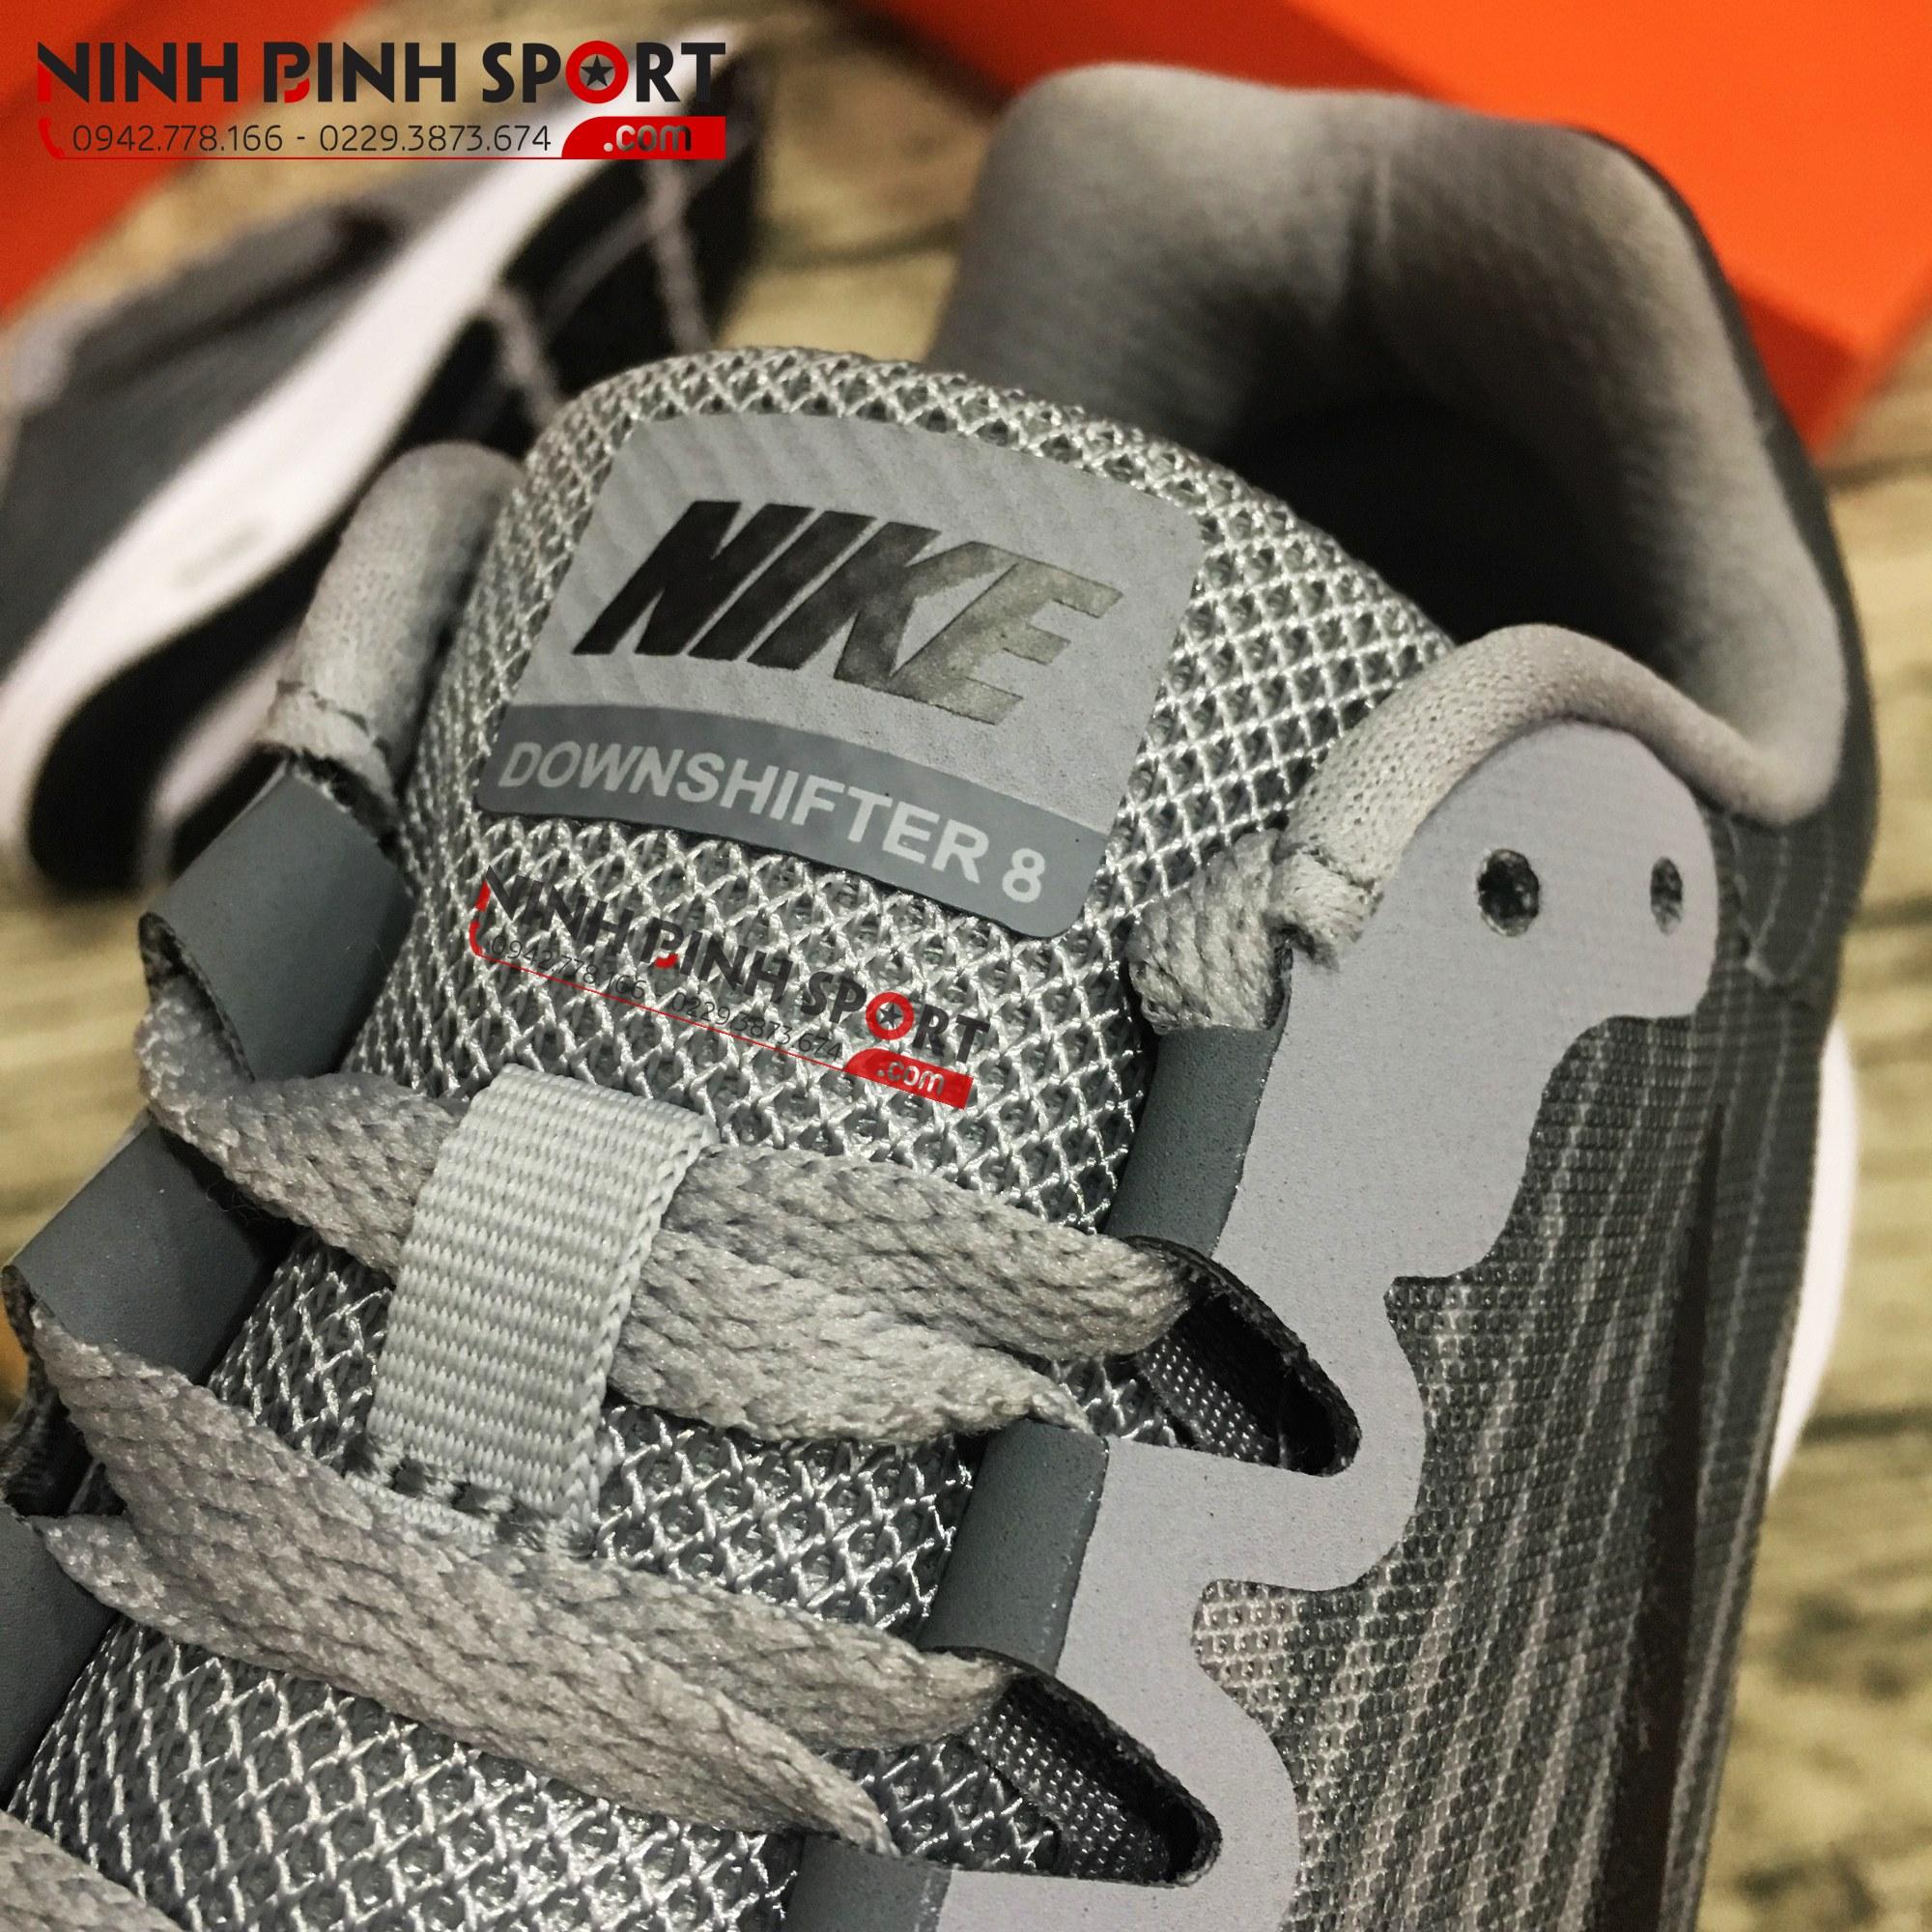 Giầy thể thao nam Nike Downshifter 8 Men 908984-004